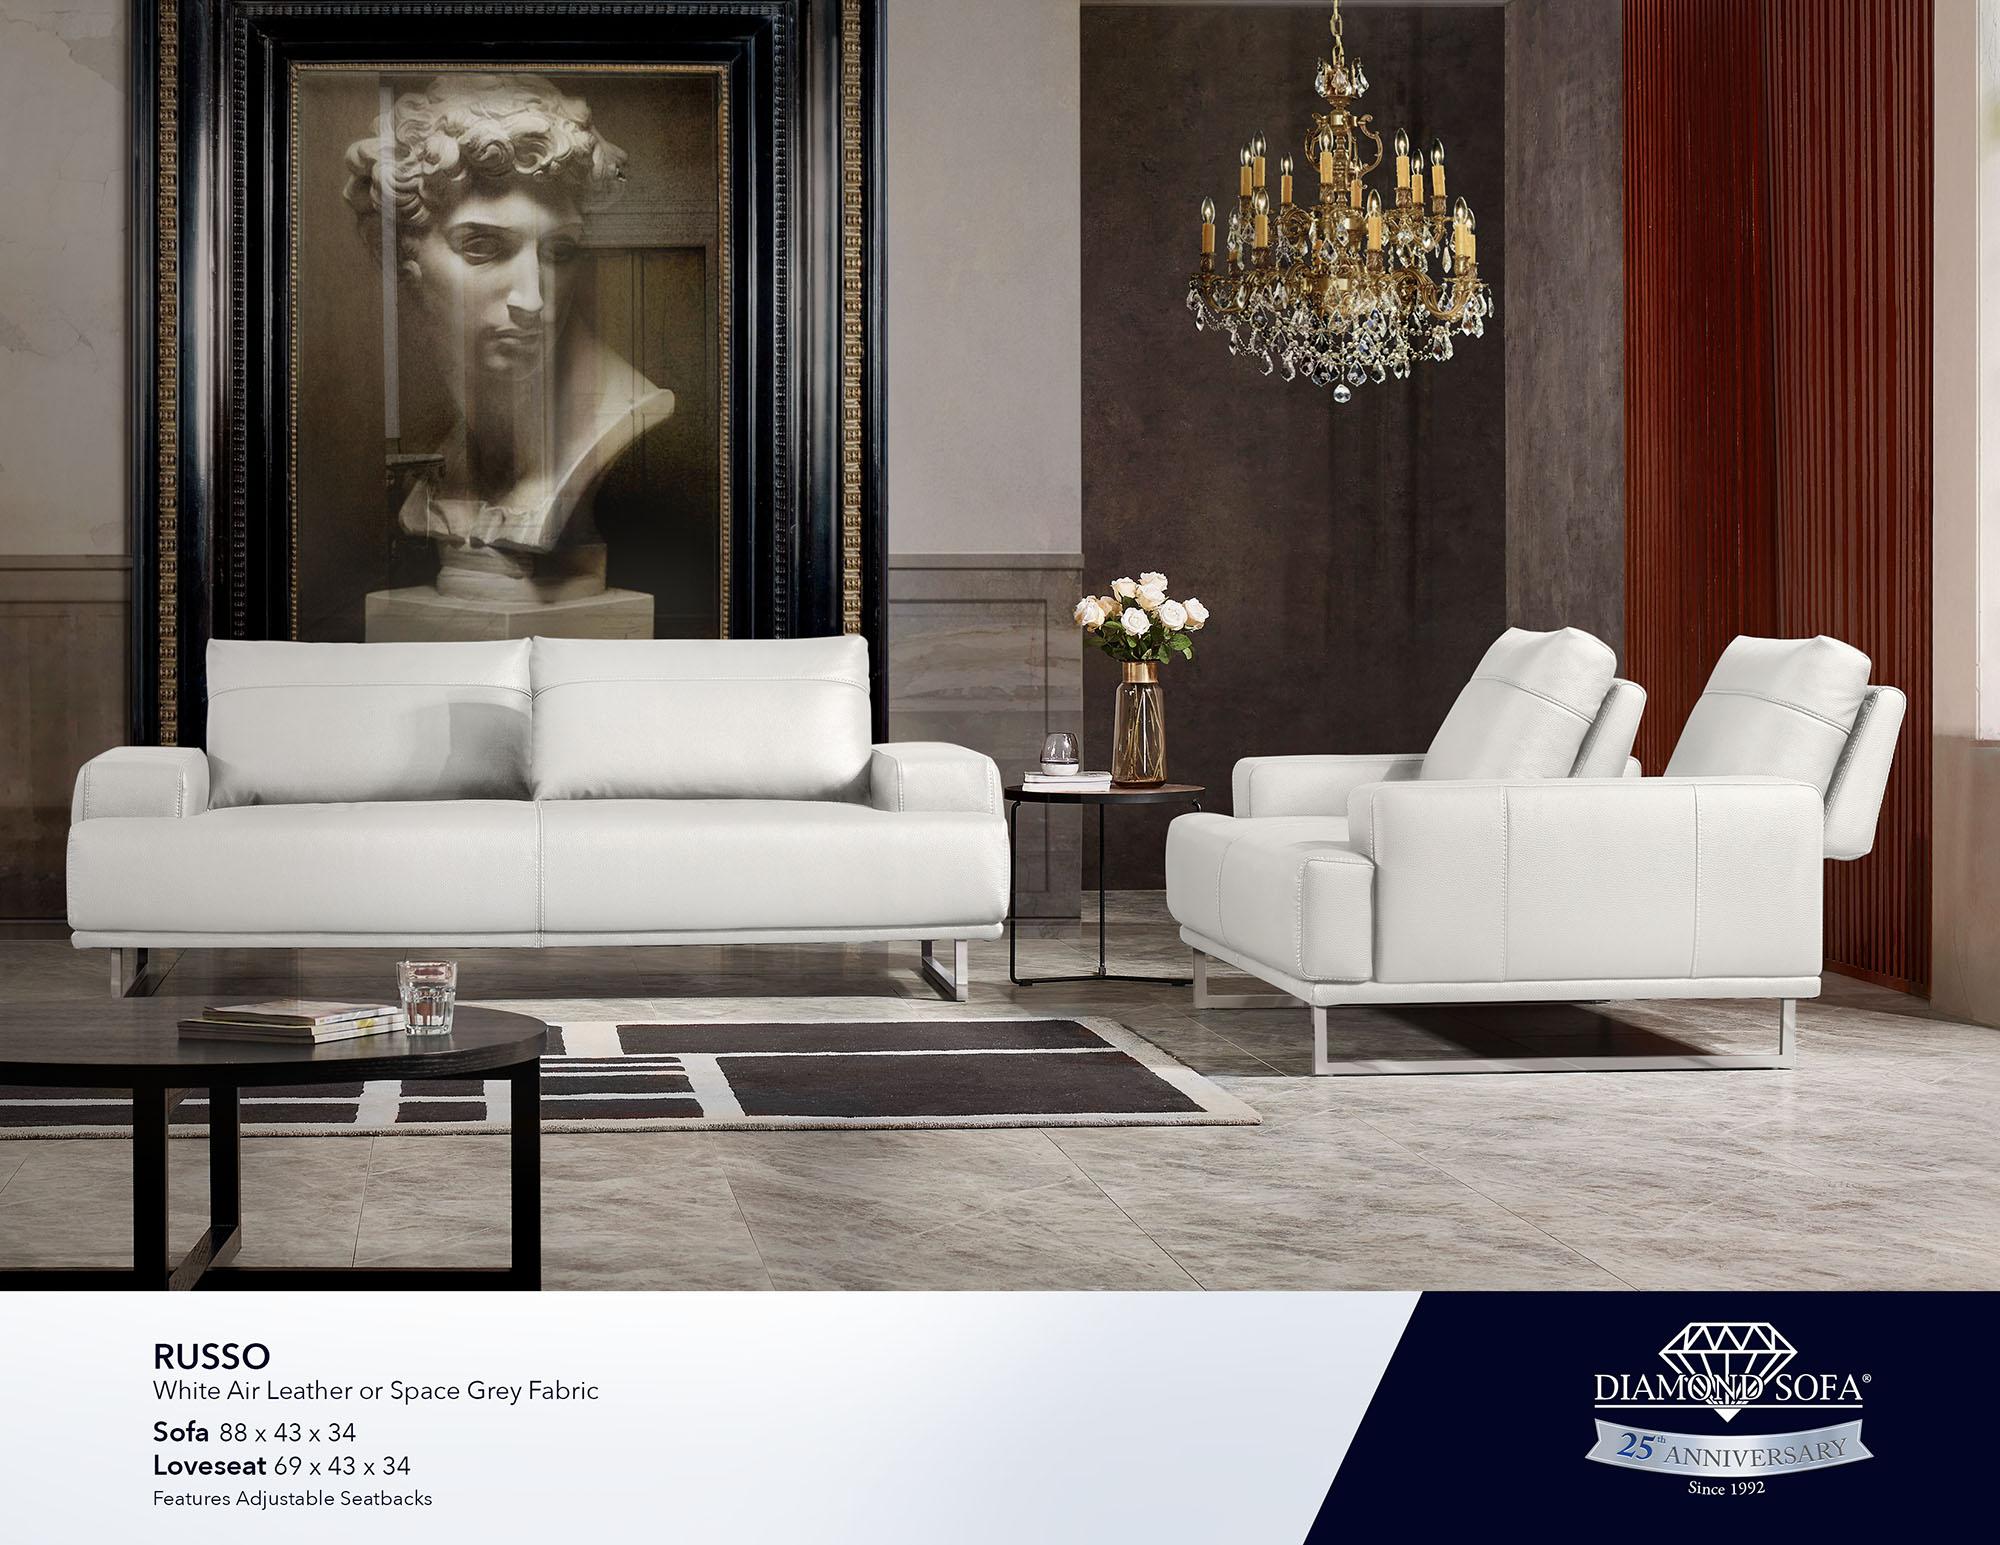 russo-sofa-loveseat.jpg